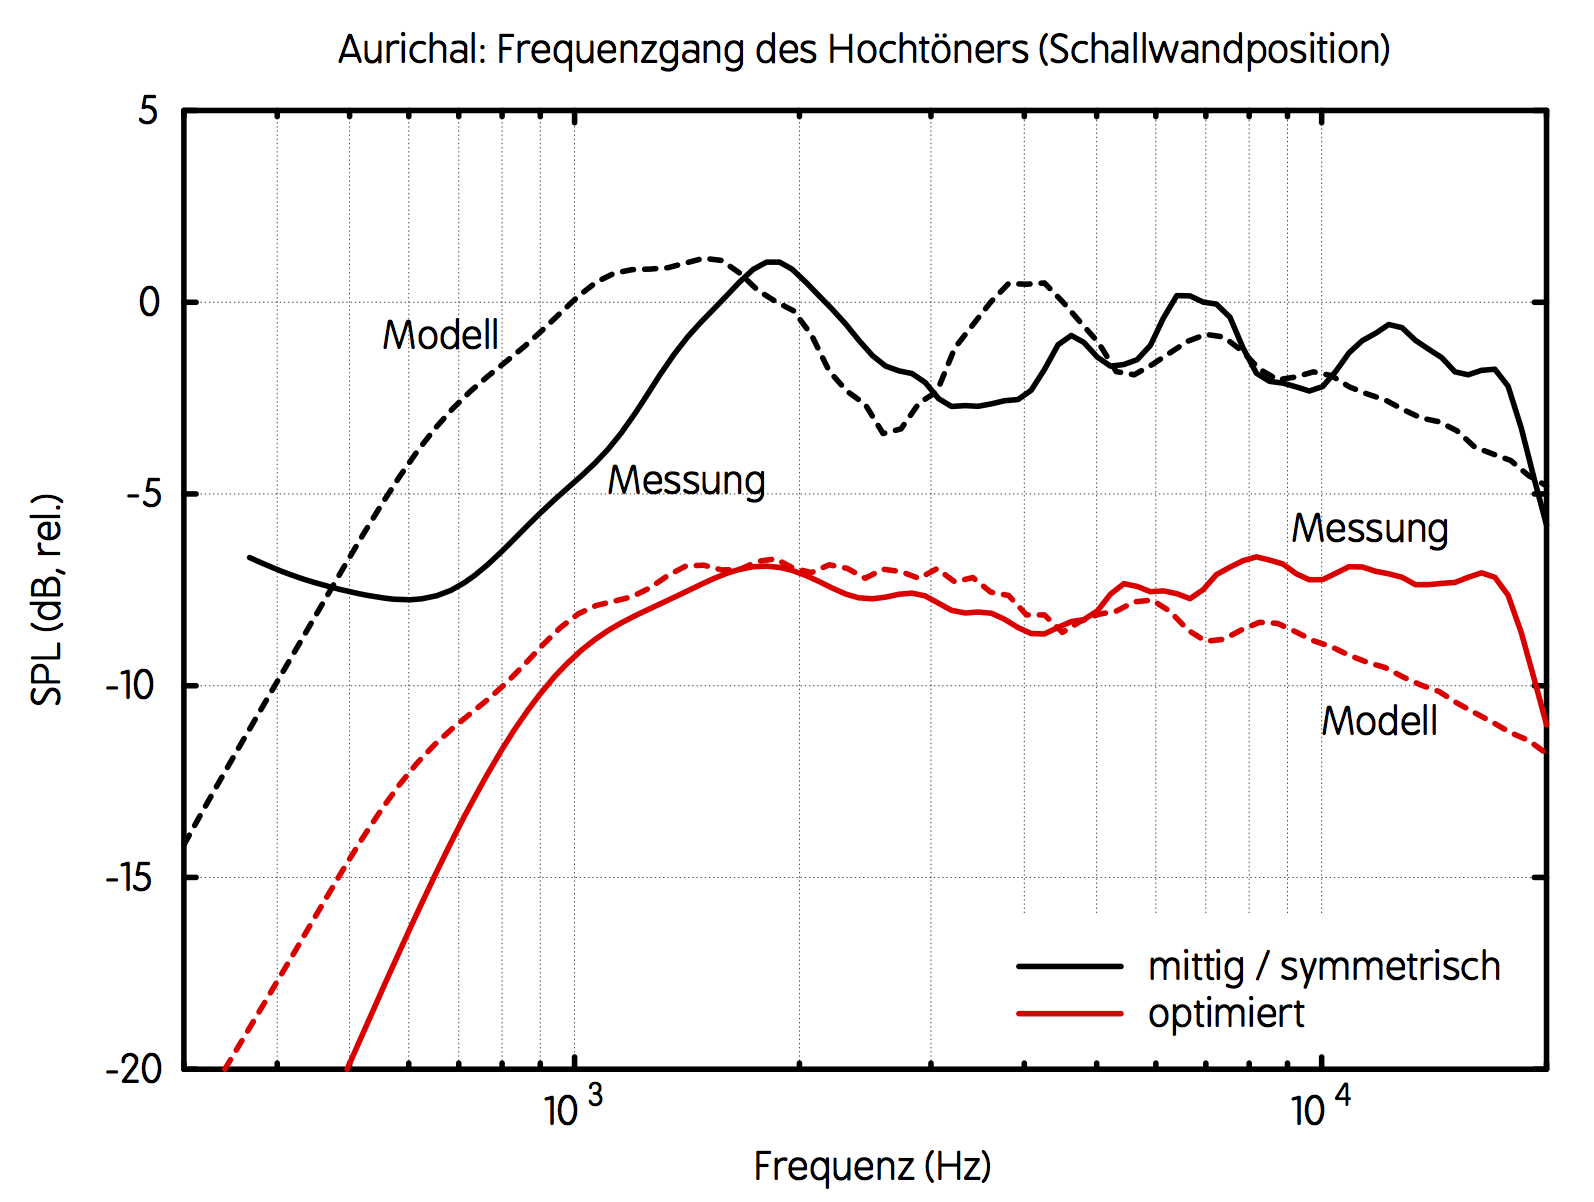 SS6640BE_bafflediffraction_measured_vs_simulated_HIBA